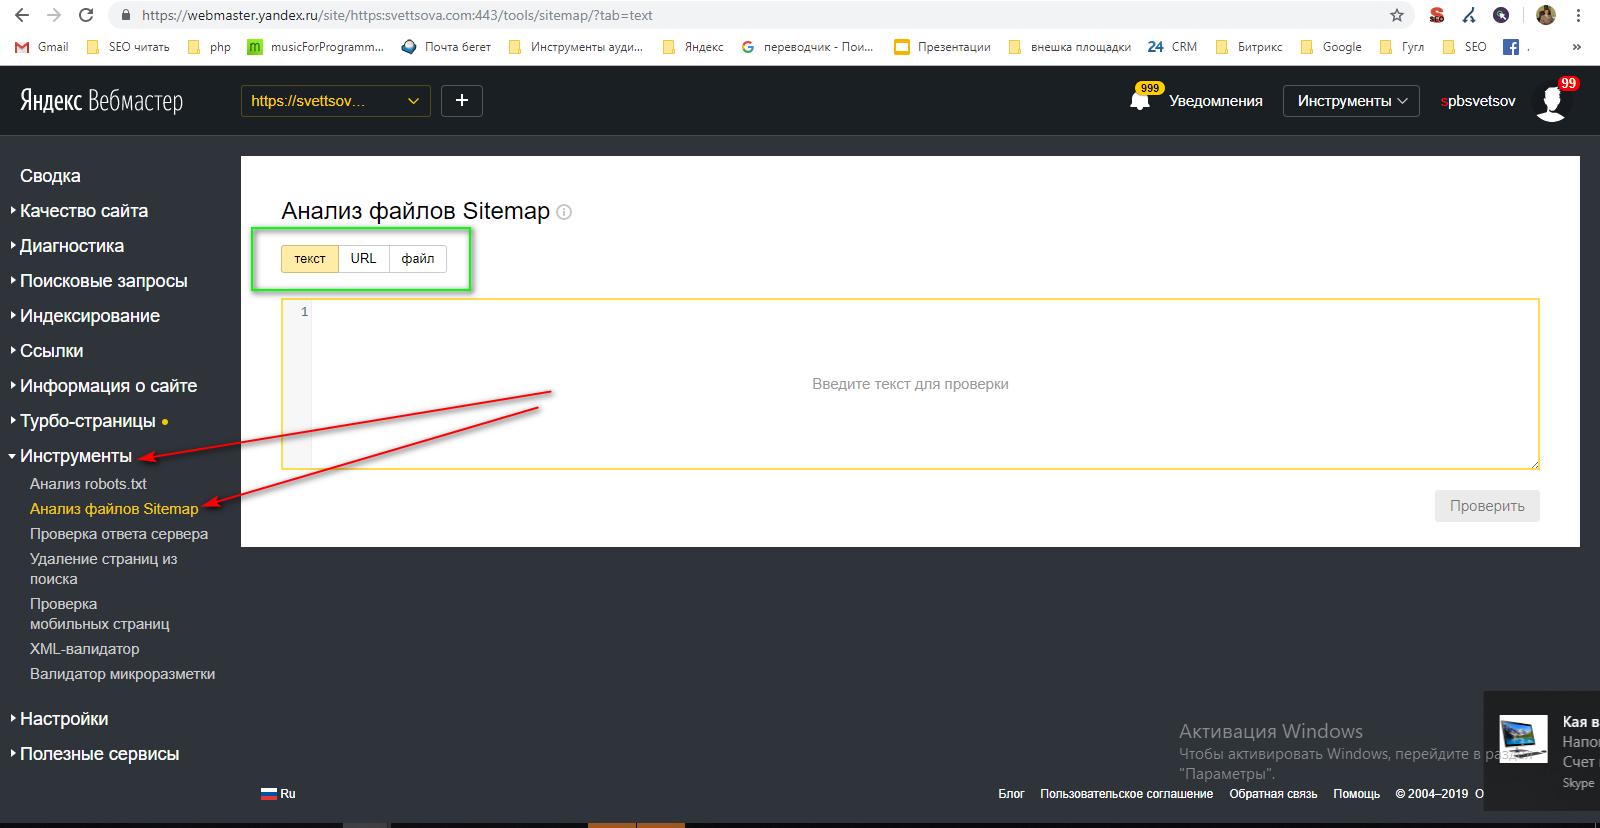 Проверка корректности карты сайта сервисом Яндекса